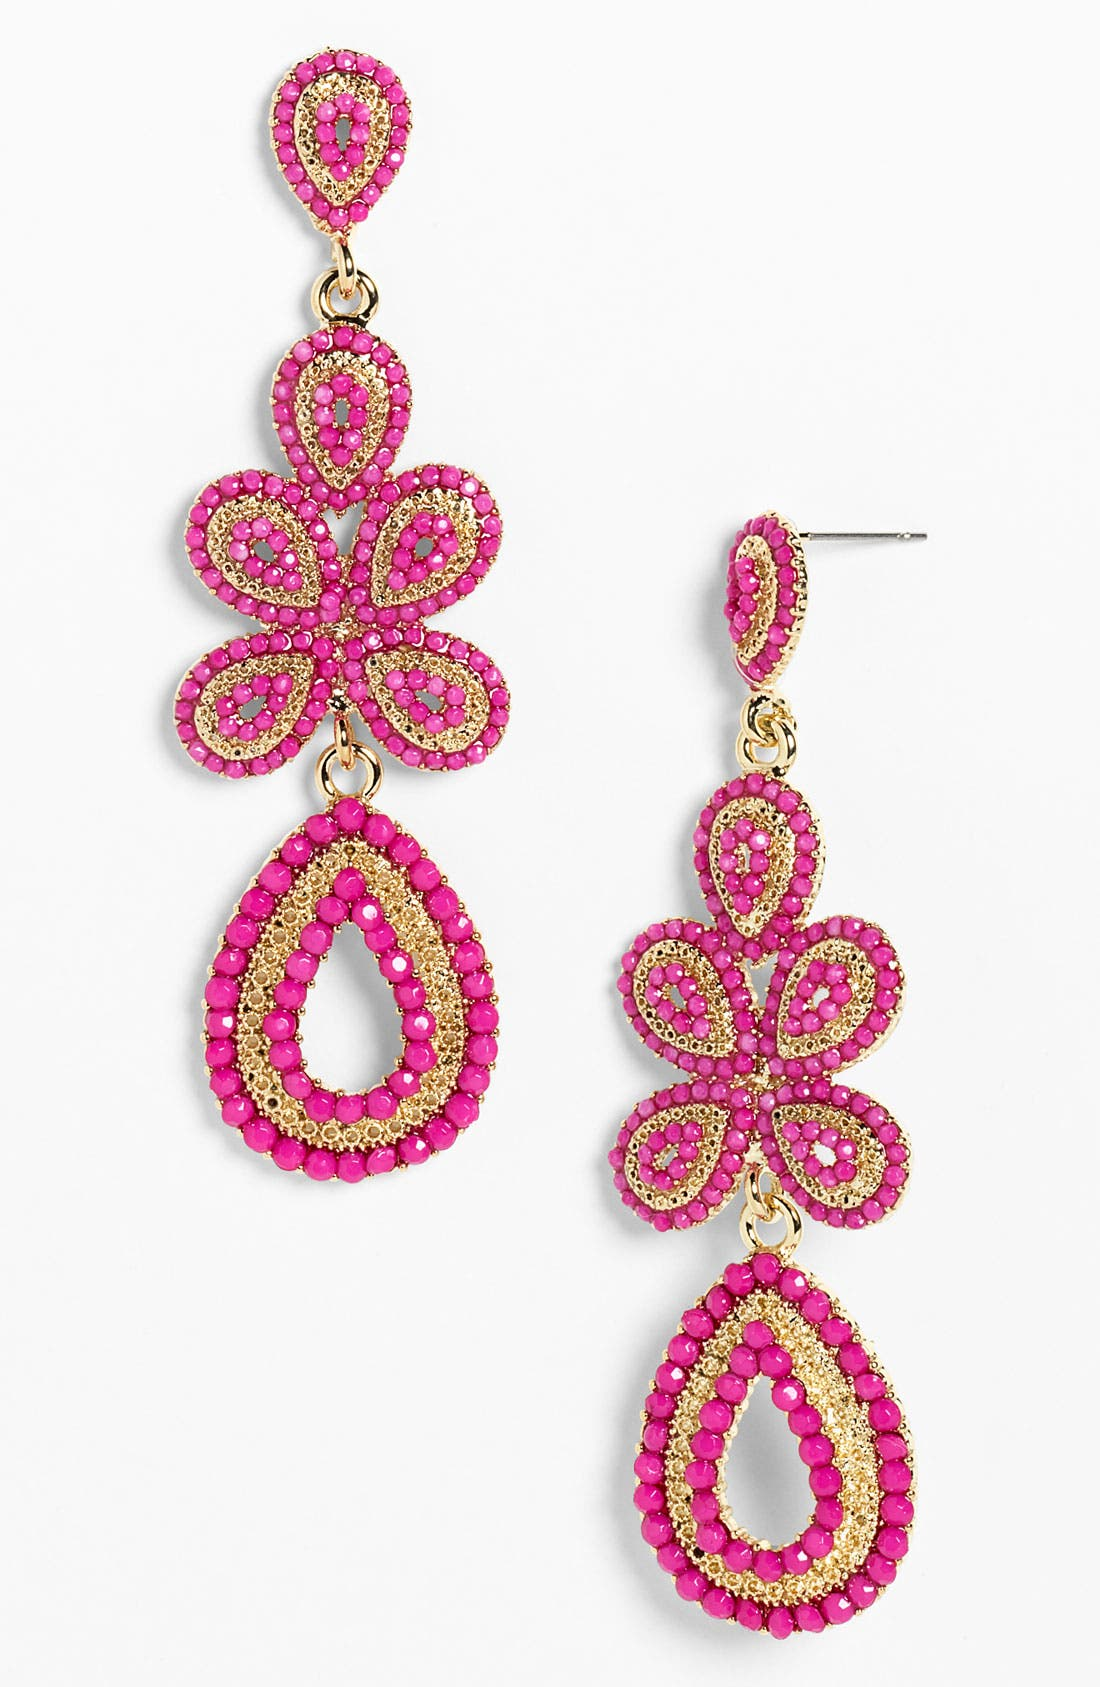 'Ornate' Linear Statement Earrings,                             Main thumbnail 13, color,